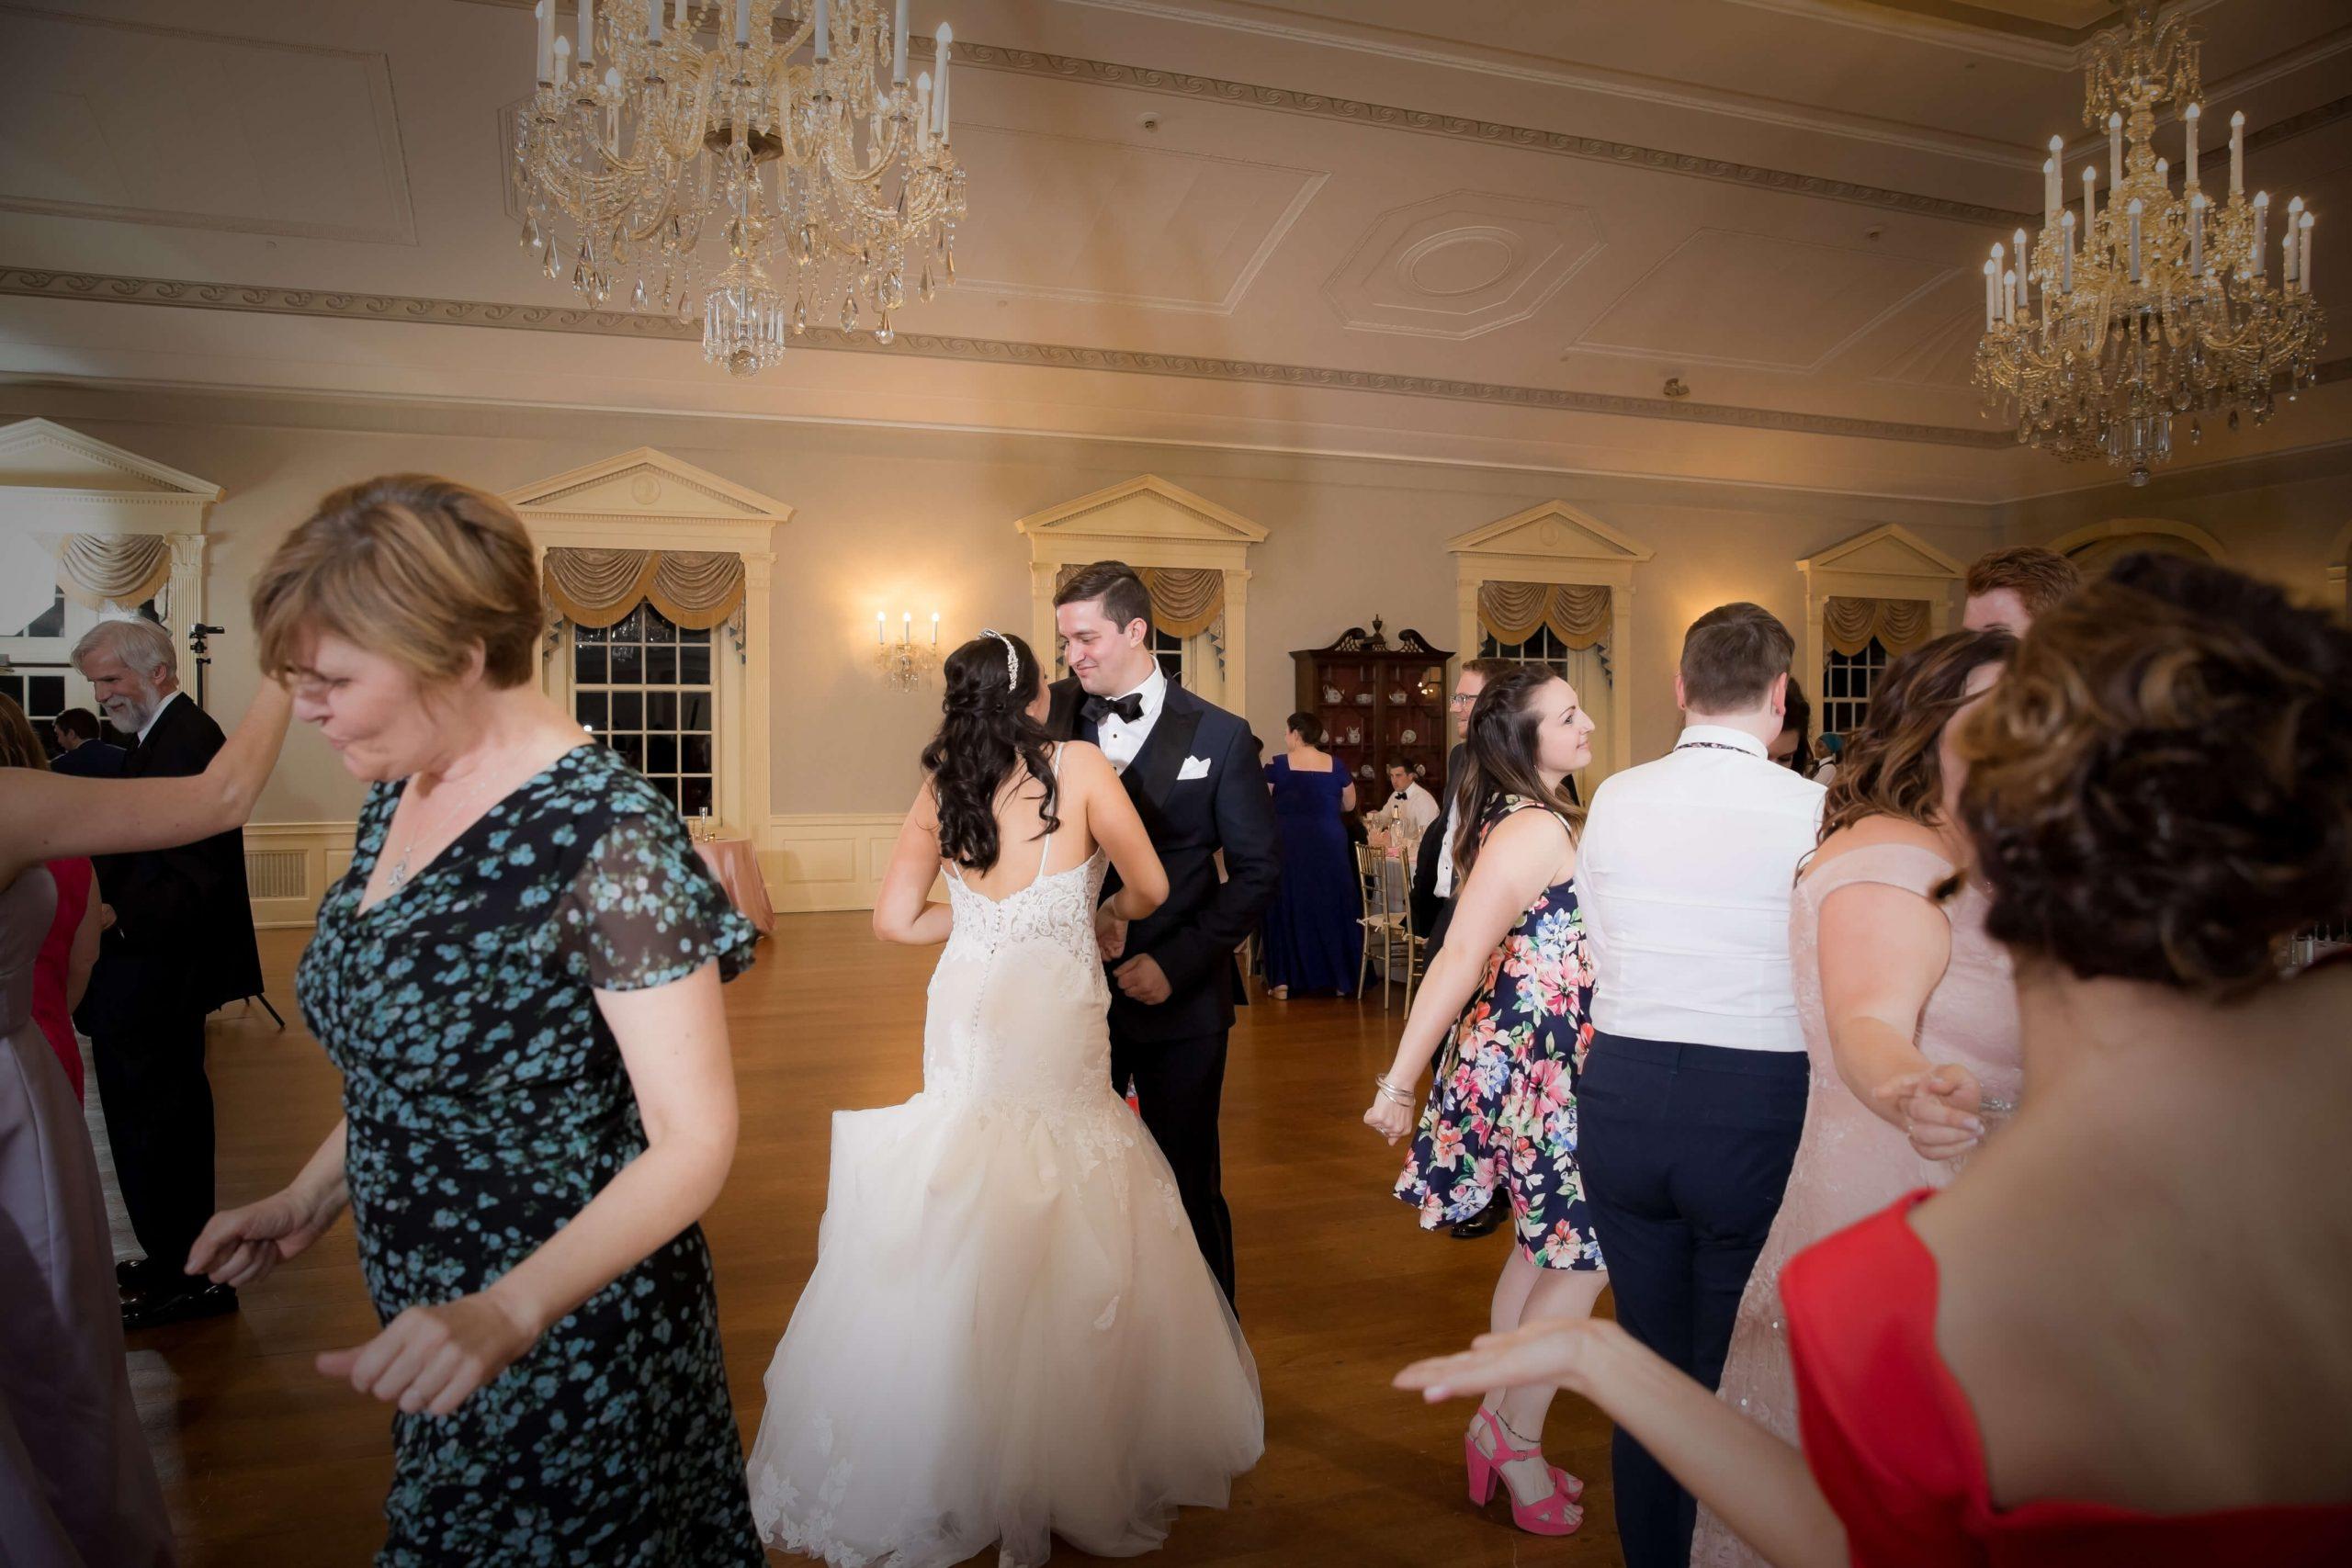 michigan wedding dj playing music for packed dance floor